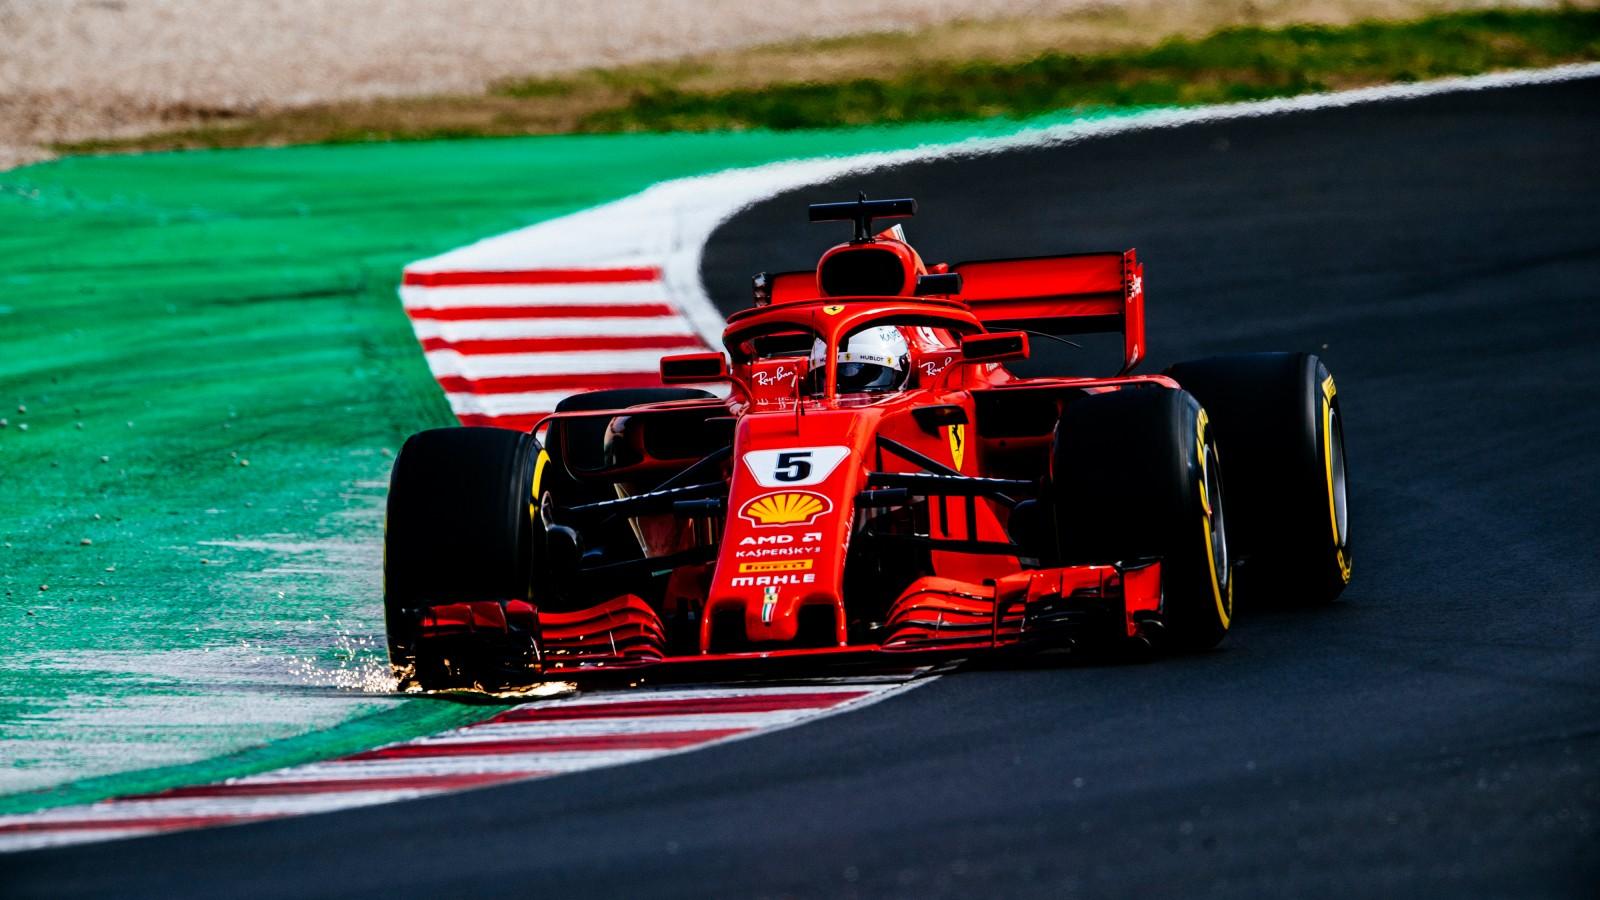 2018 Ferrari Sf71h F1 Formula 1 4k 2 Wallpaper Hd Car